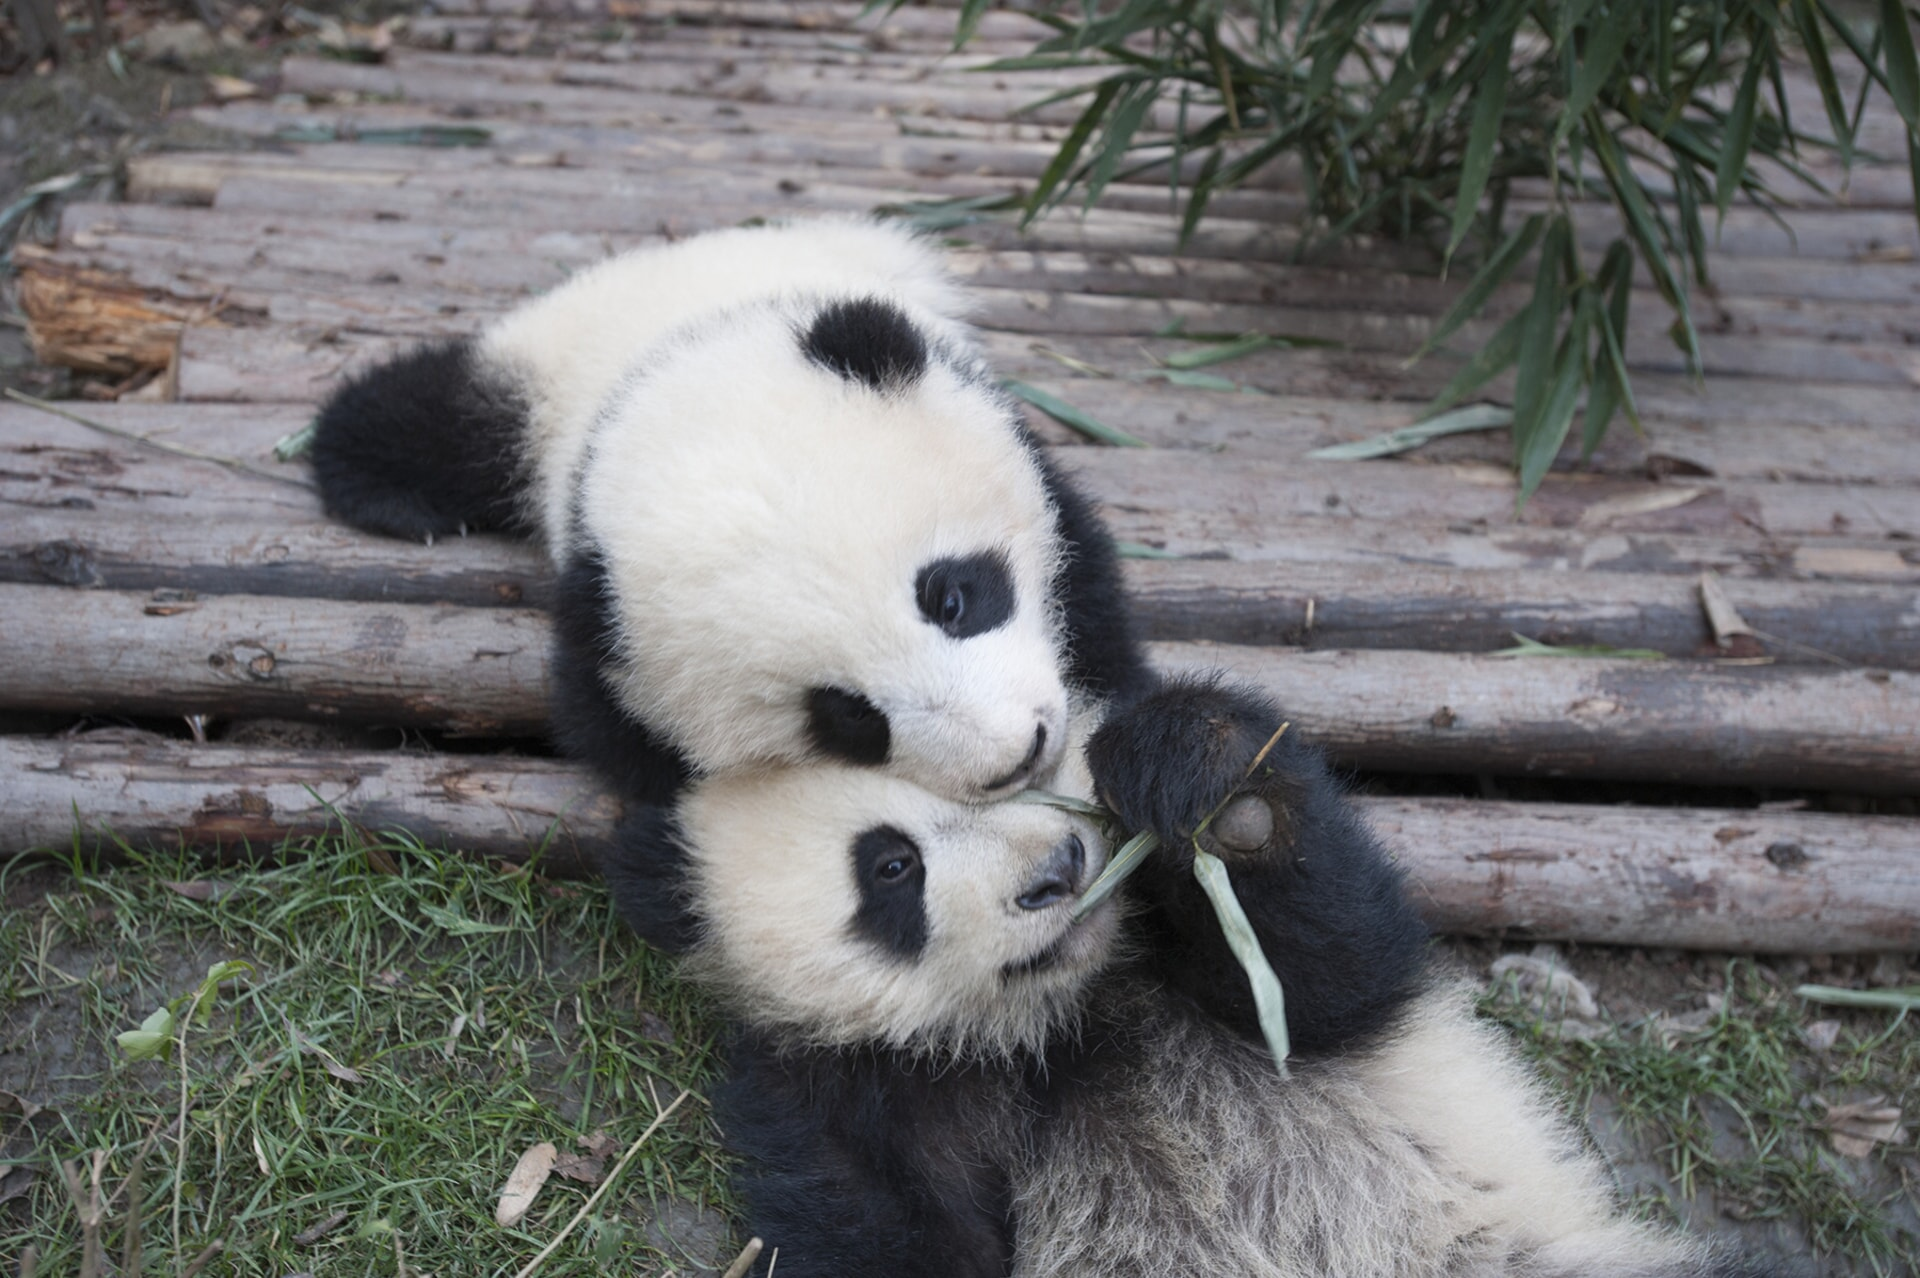 Giant Panda cubs at China's Chengdu Panda Base as seen in the new IMAX® film, PANDAS